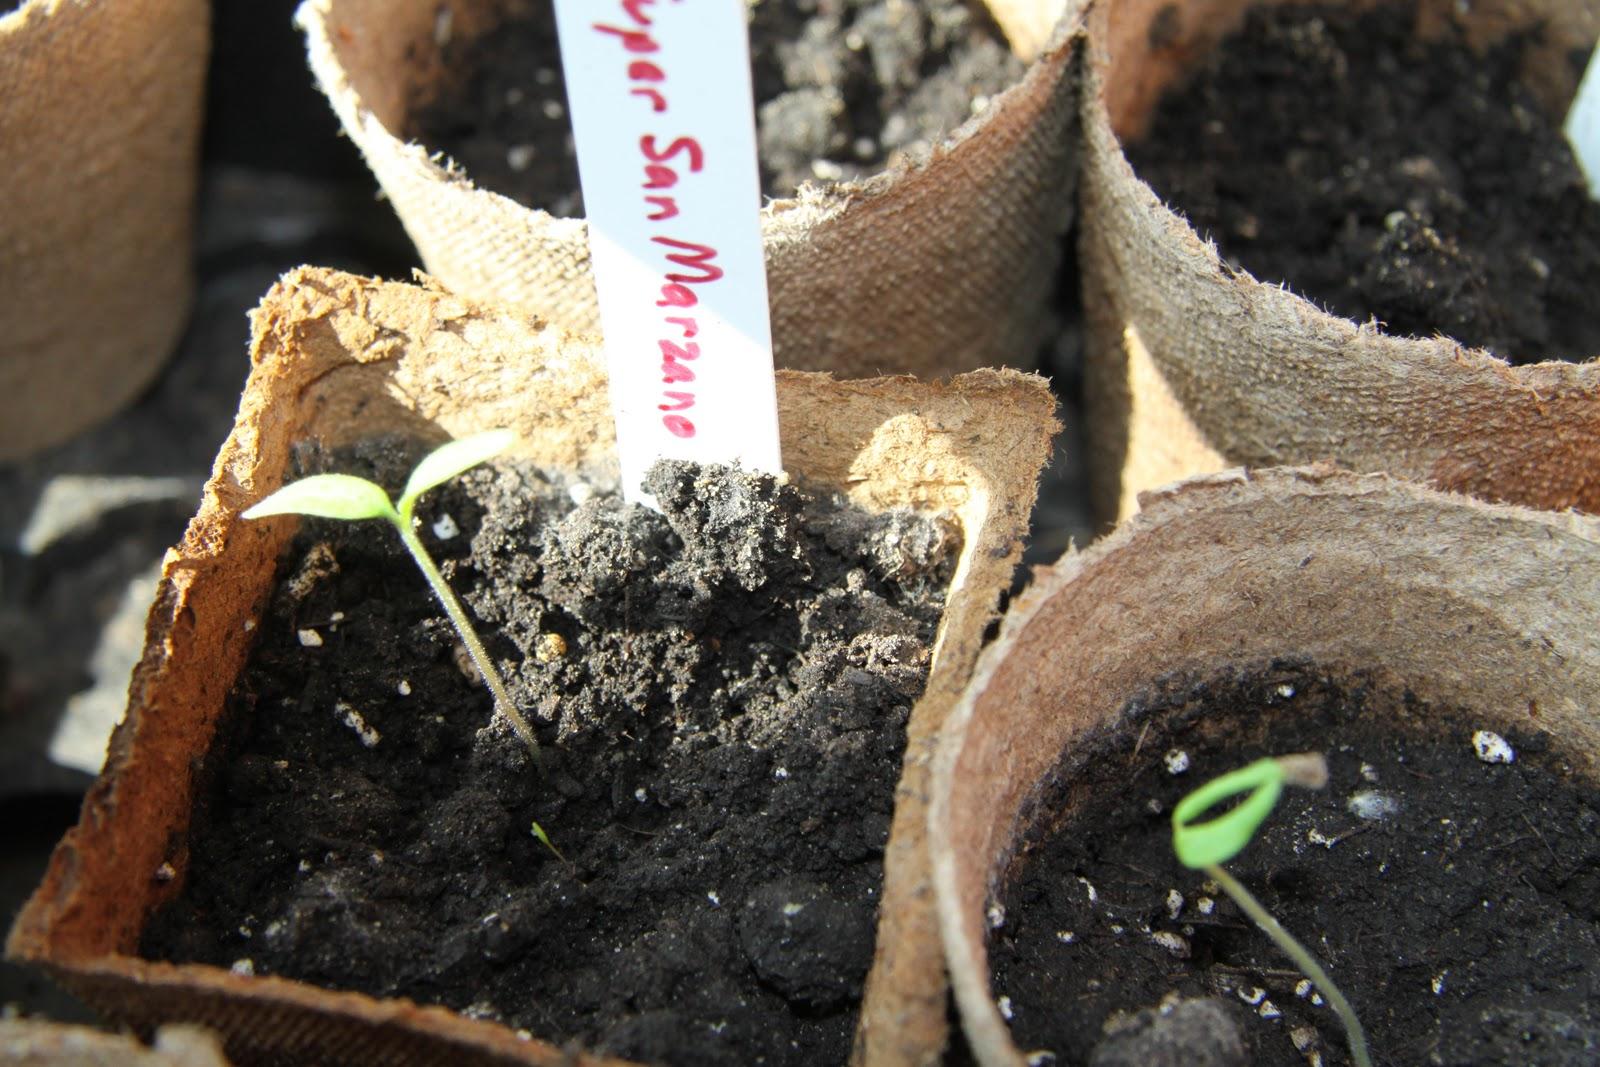 Soaking pepper seeds before planting in a sponge: the secret of strong pepper seedlings 75